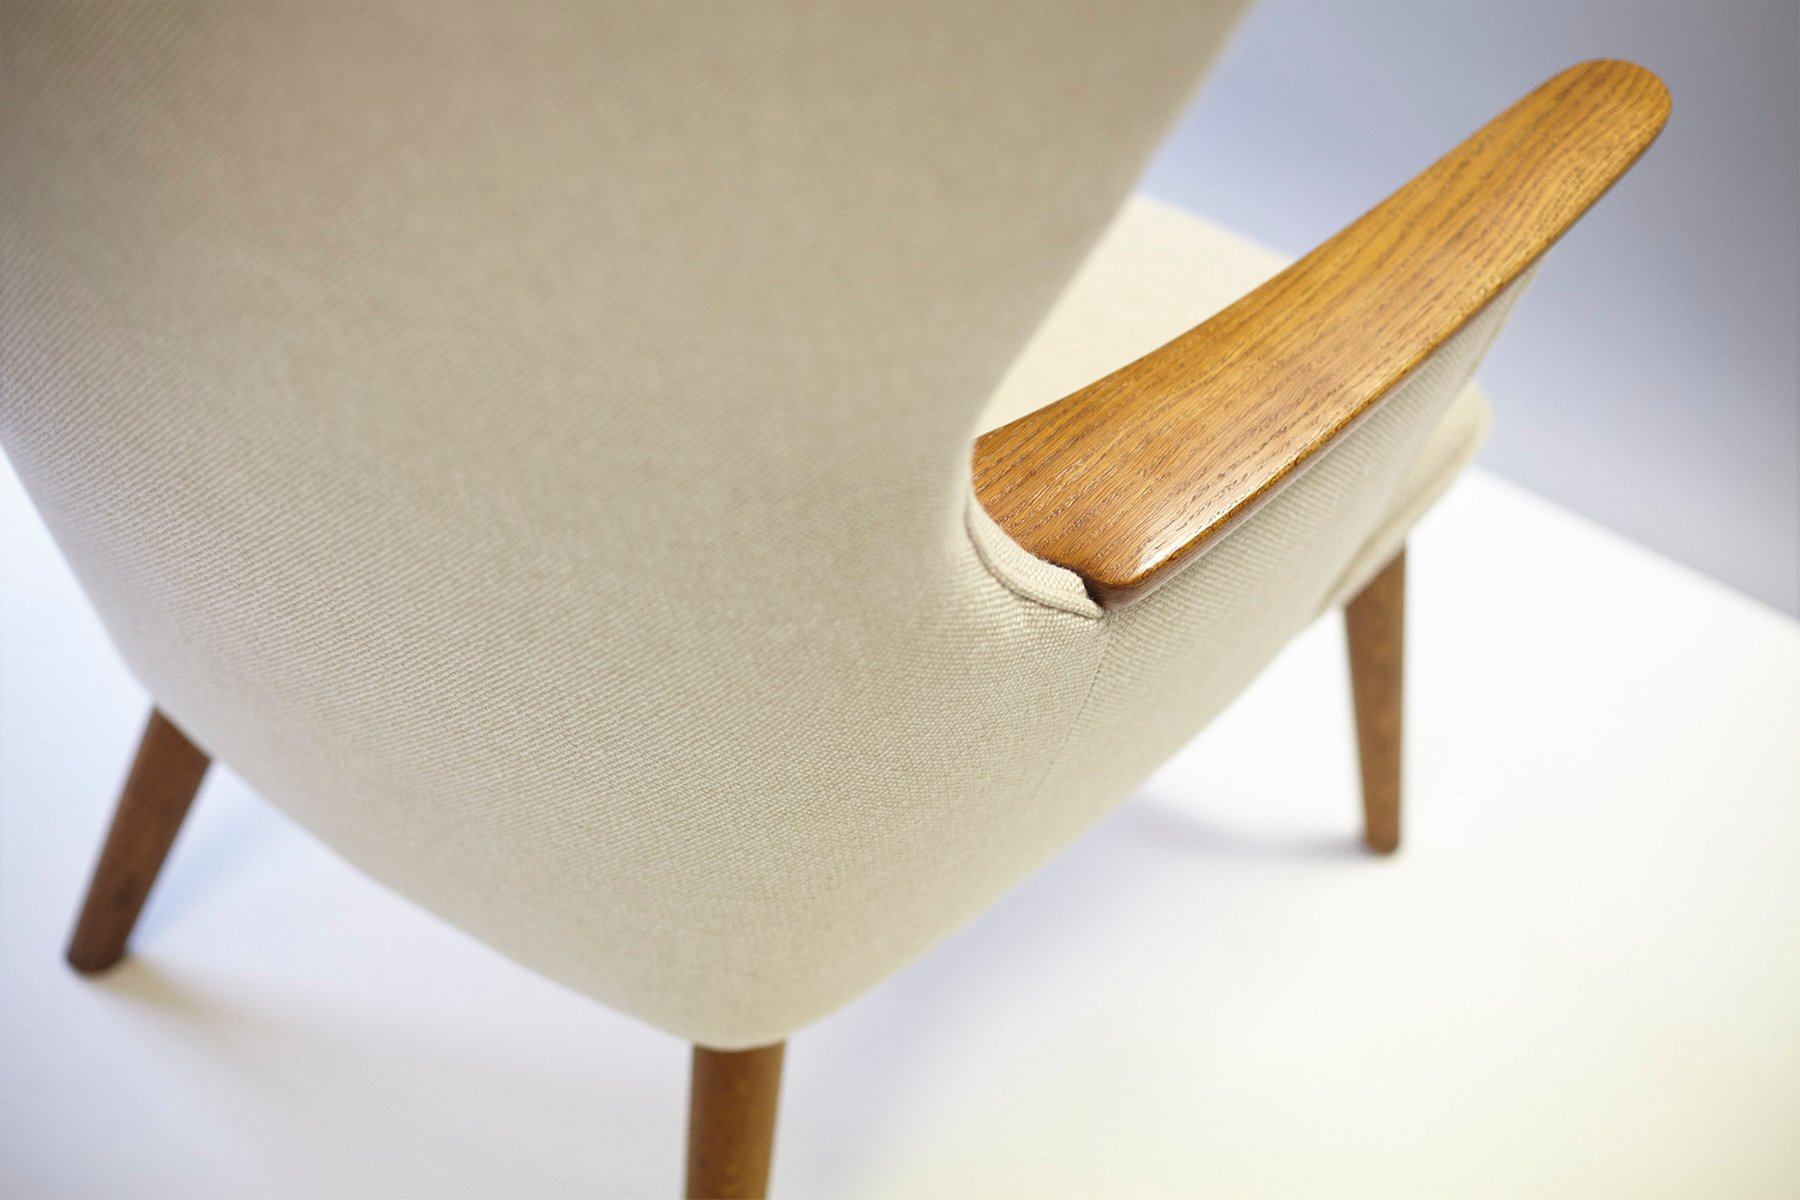 AP 28 Mama Bear Chair by Hans J Wegner 1954 for sale at Pamono